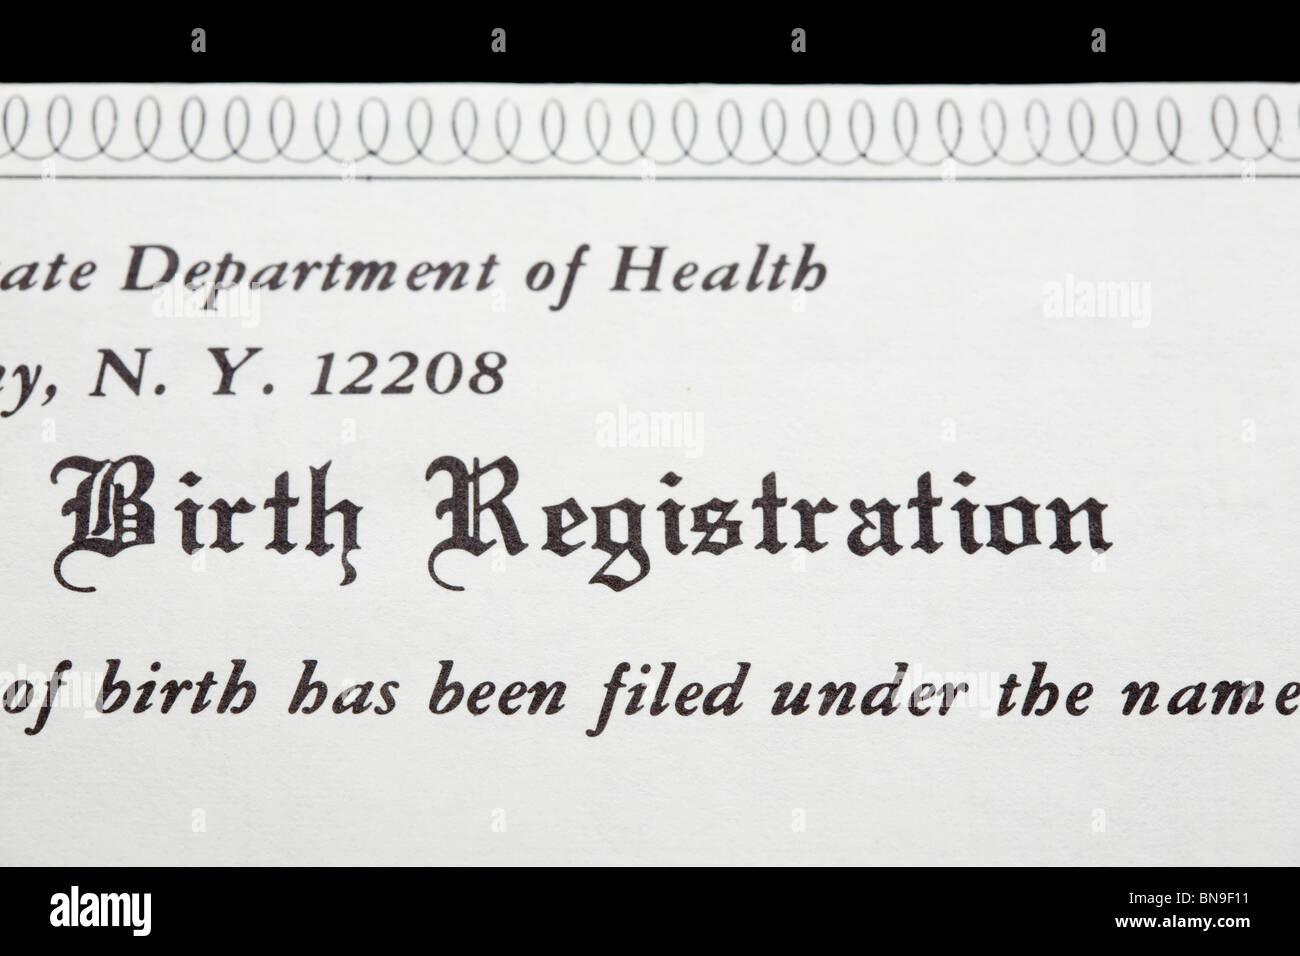 Birth Registration Form Stock Photos & Birth Registration Form Stock